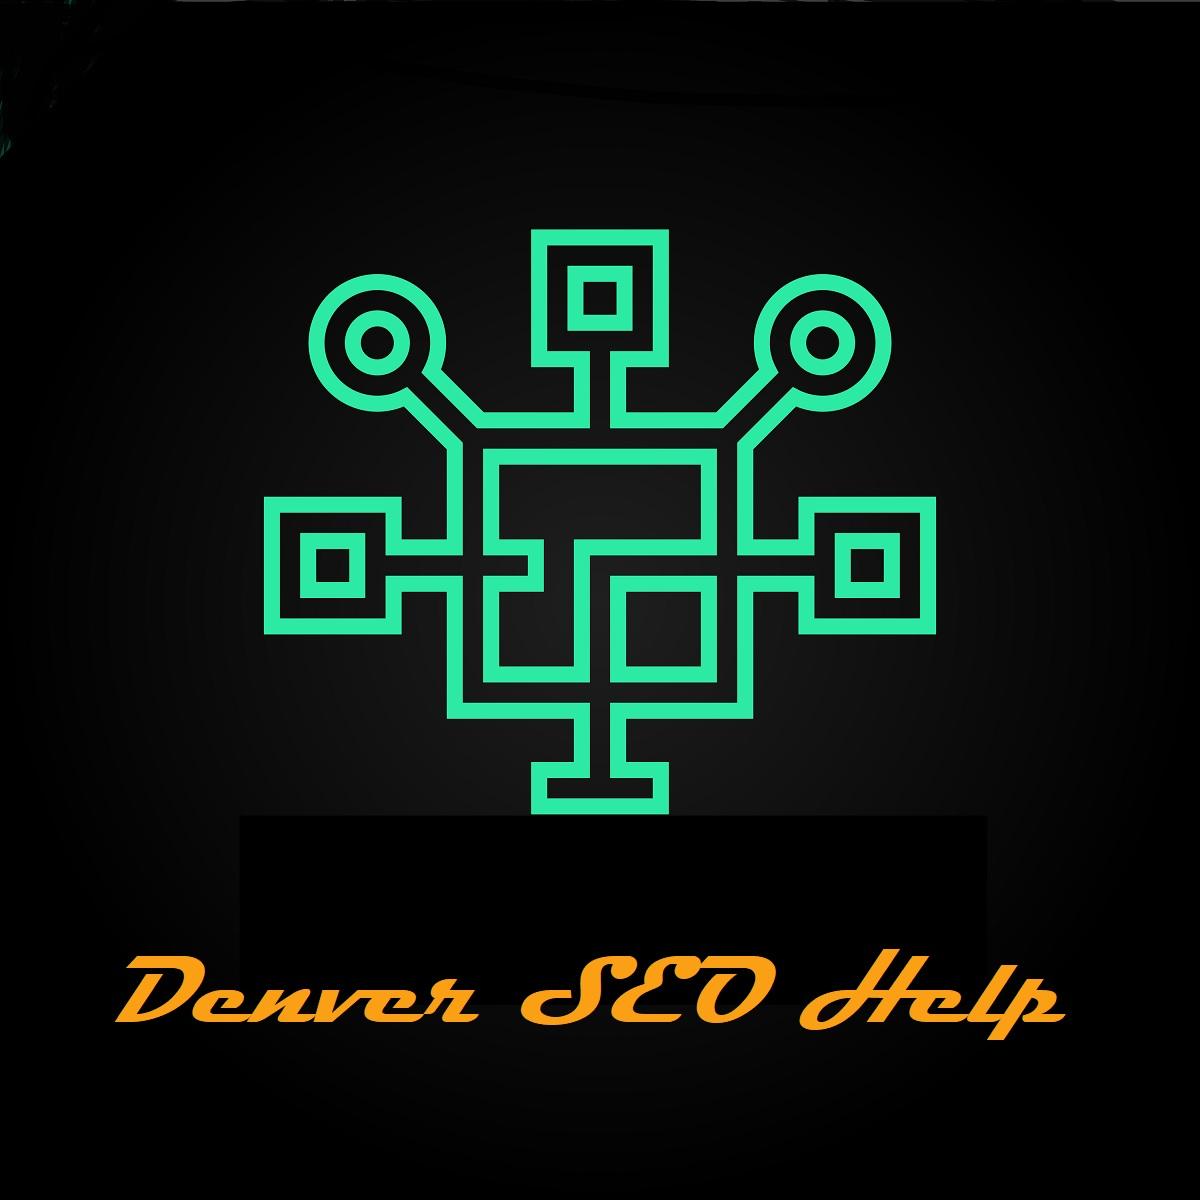 Denver-SEO-Help-1